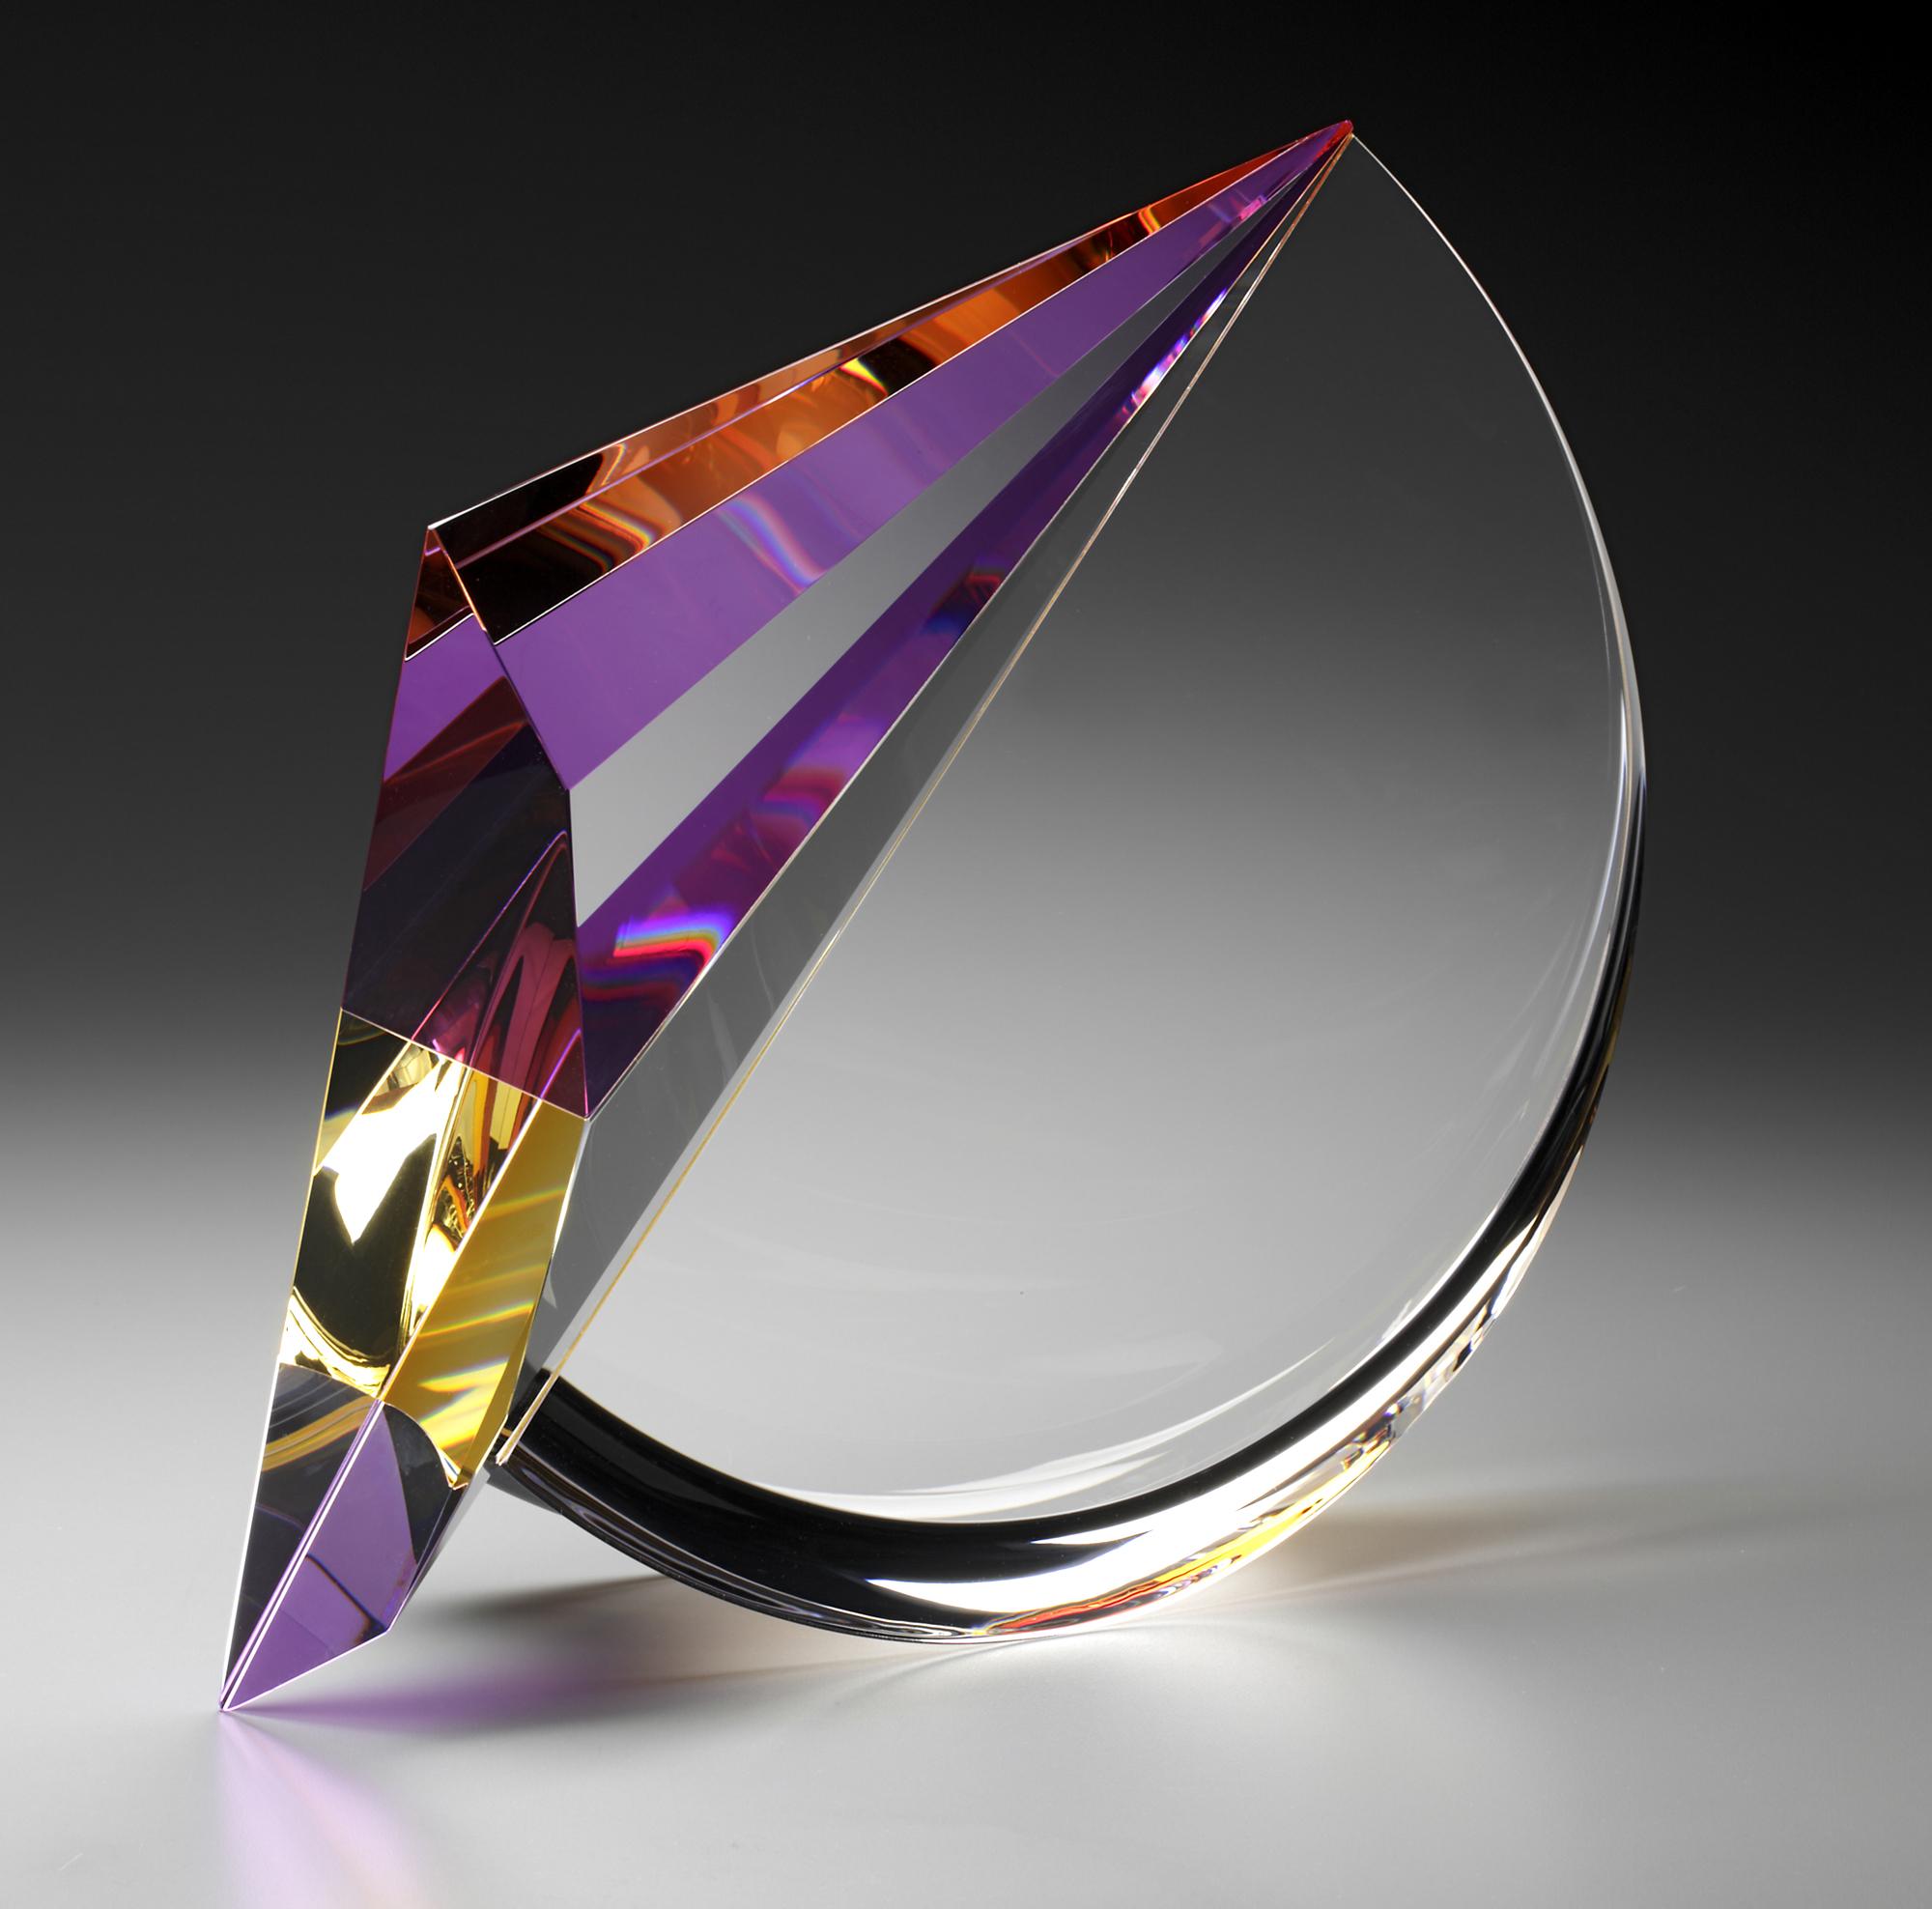 Contemporary Glass: 21st Century Innovations